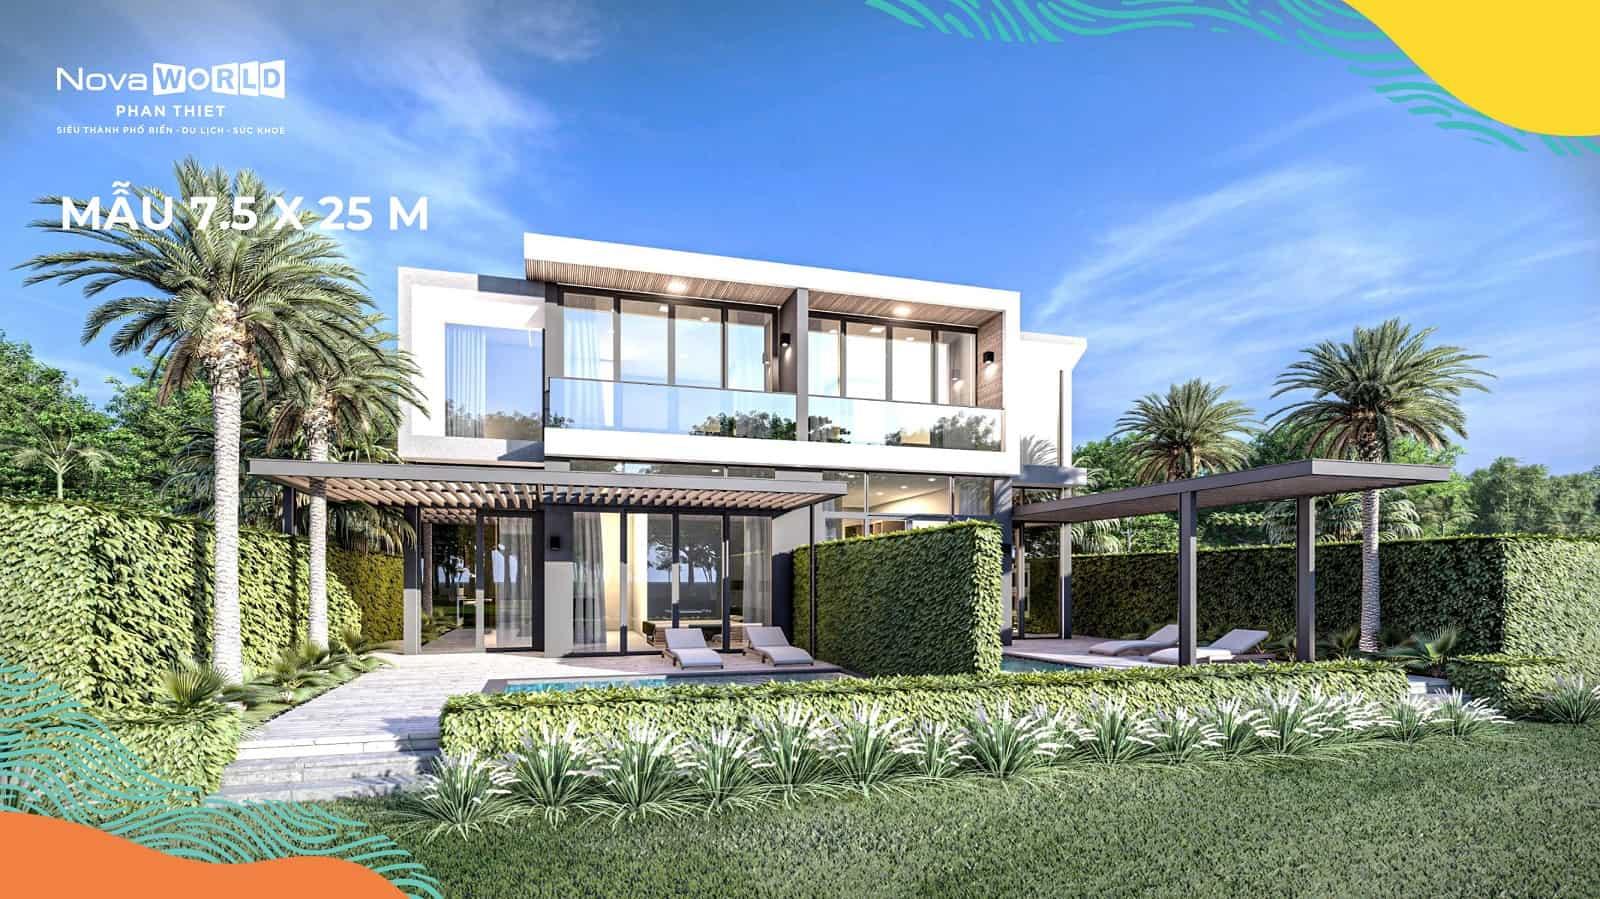 biet-thu-golf-villas-7.5x25-novaworld-phan-thiet